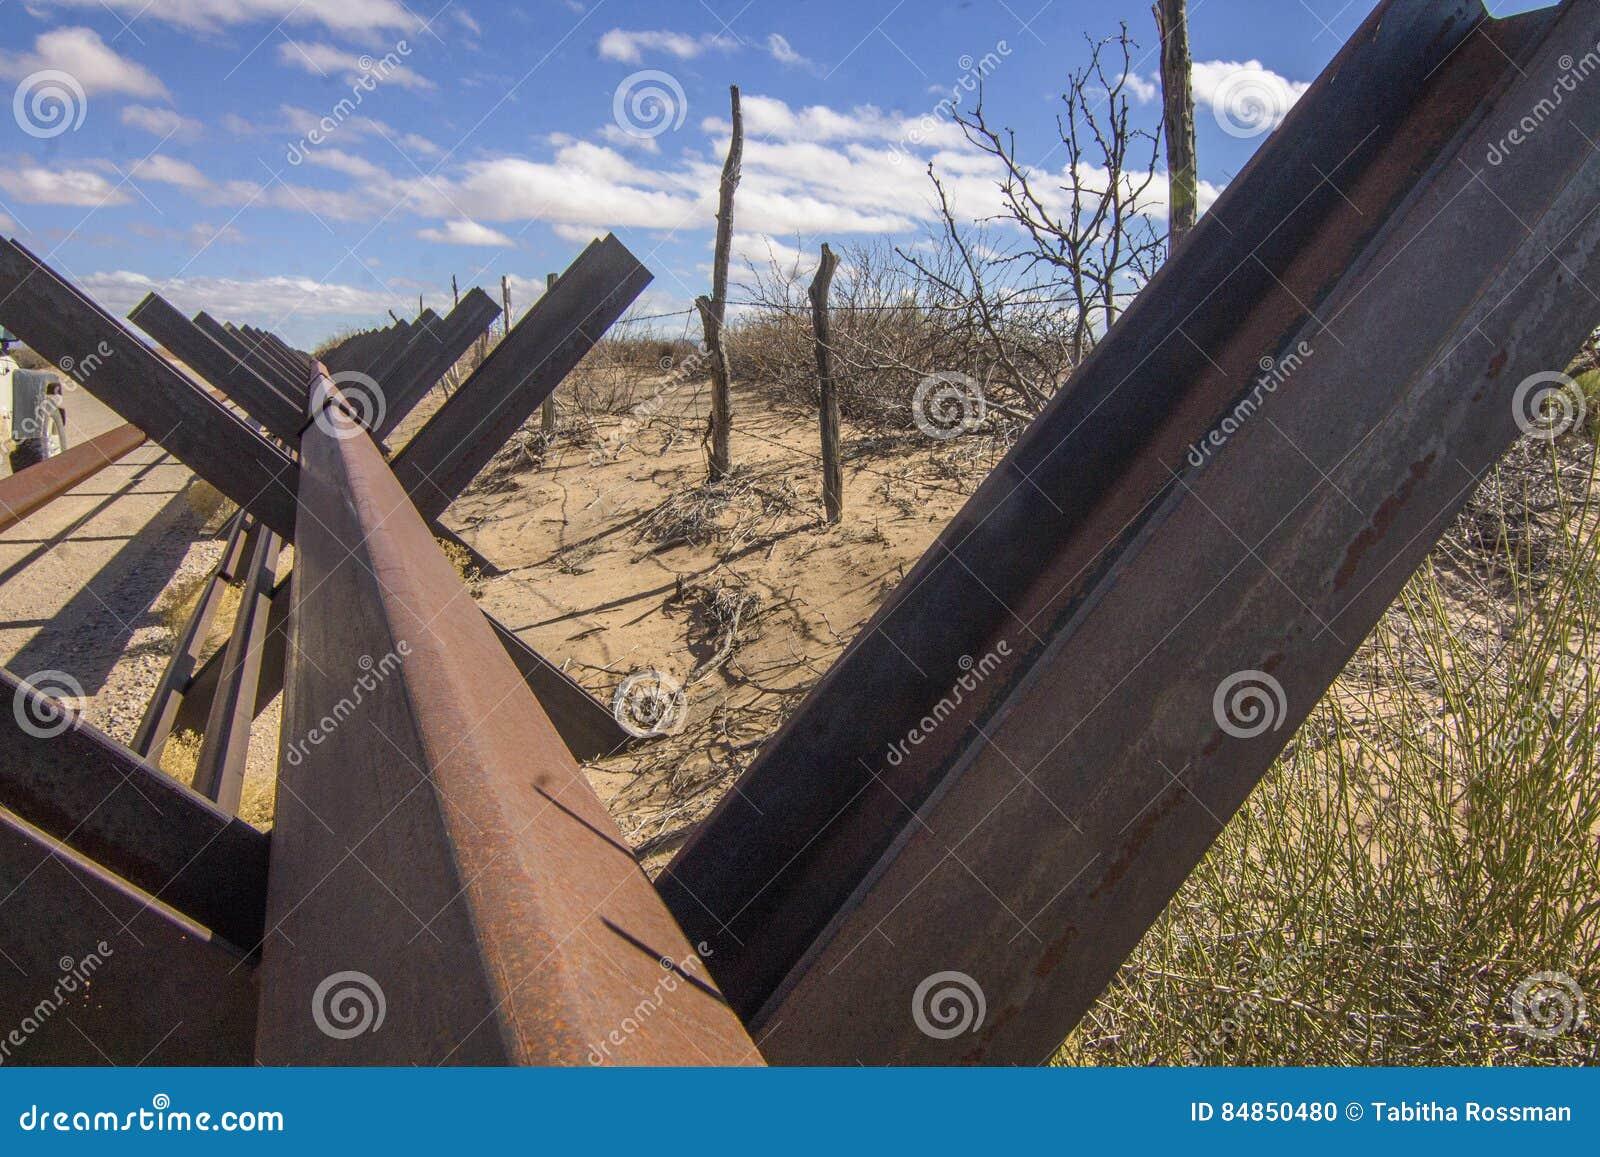 Zaune Des New Mexiko Usa Und Mexikos Grenz Stockfoto Bild Von